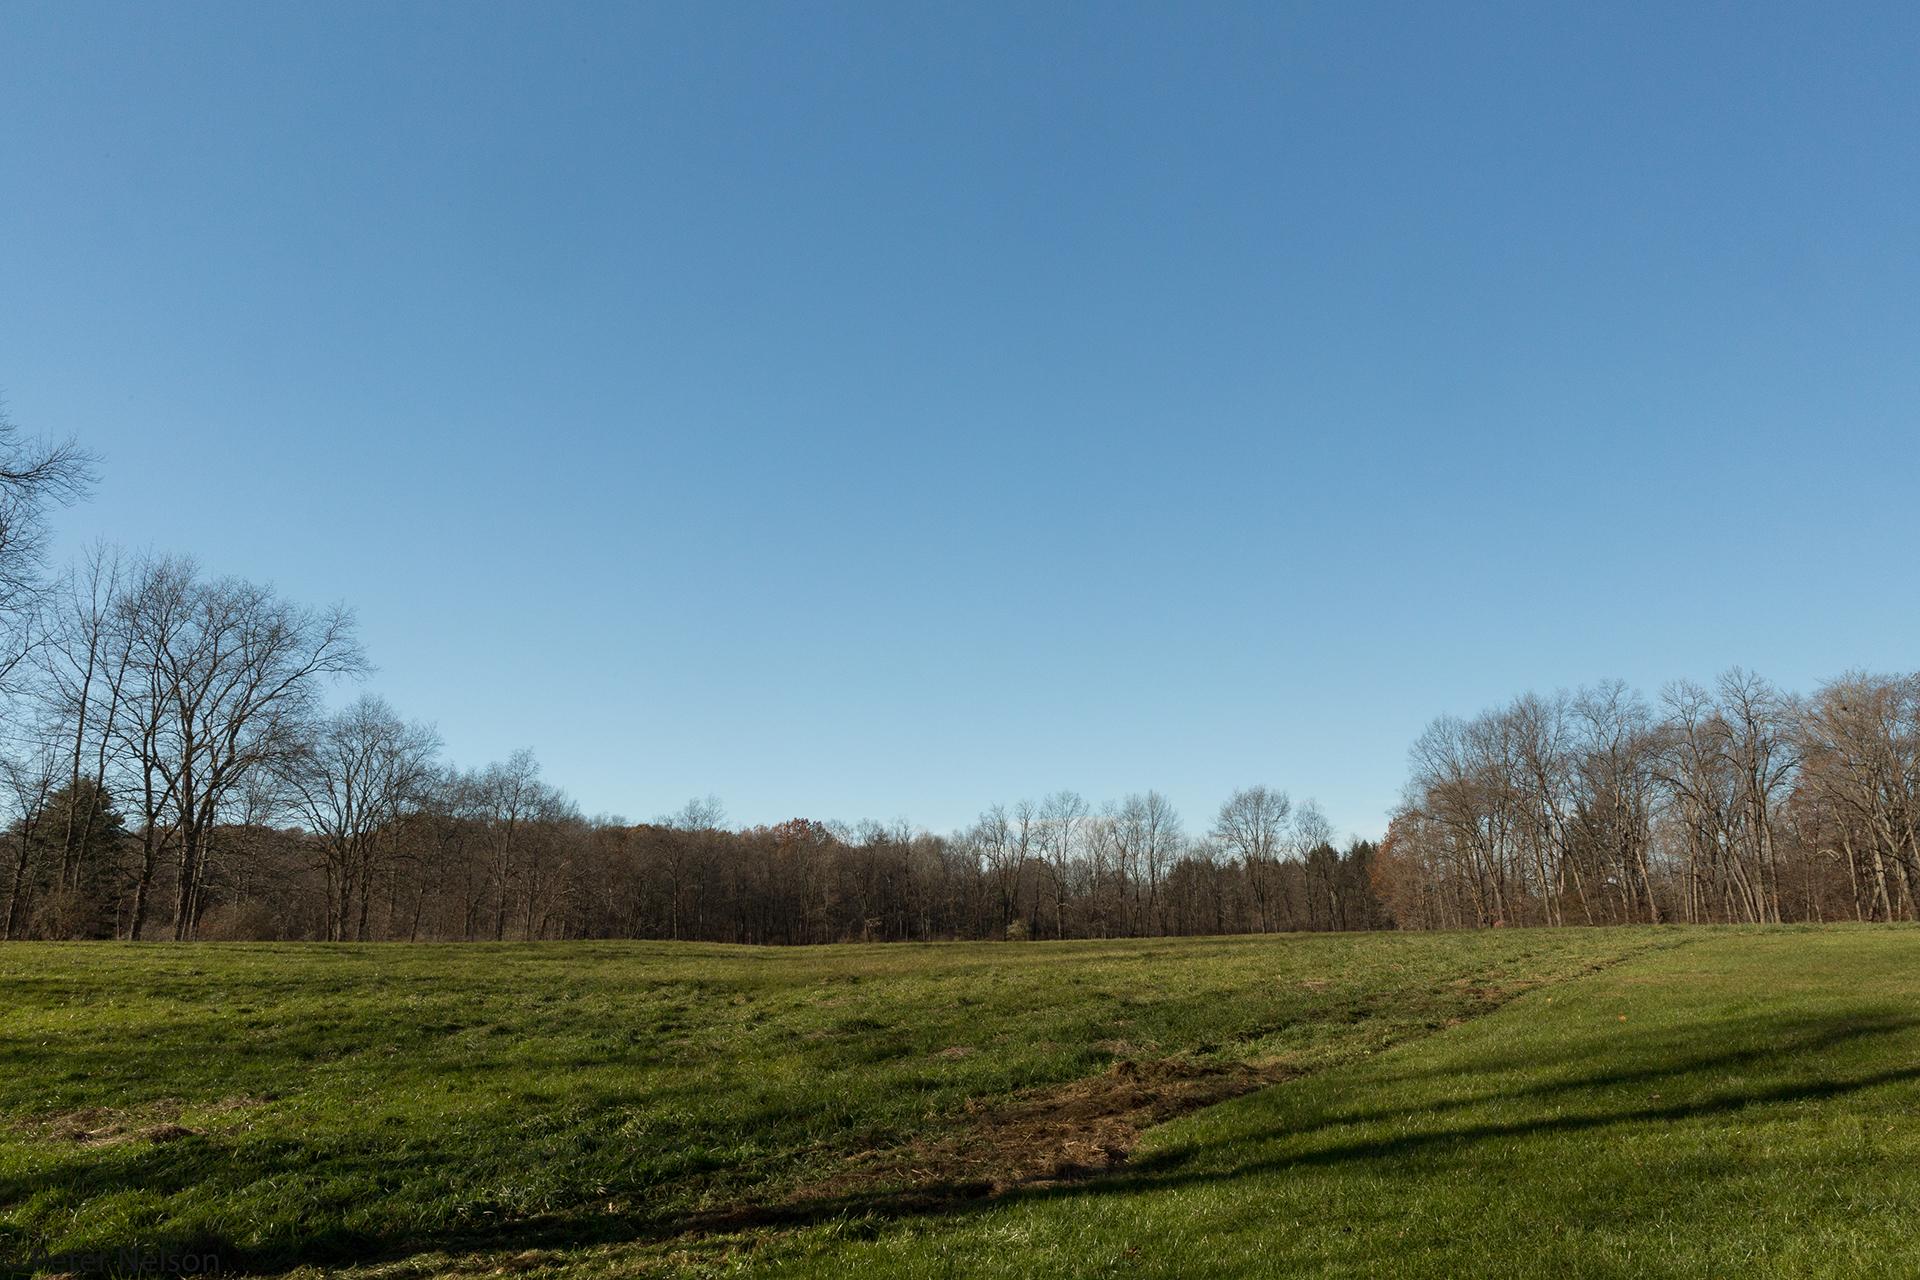 A mown Hay Field